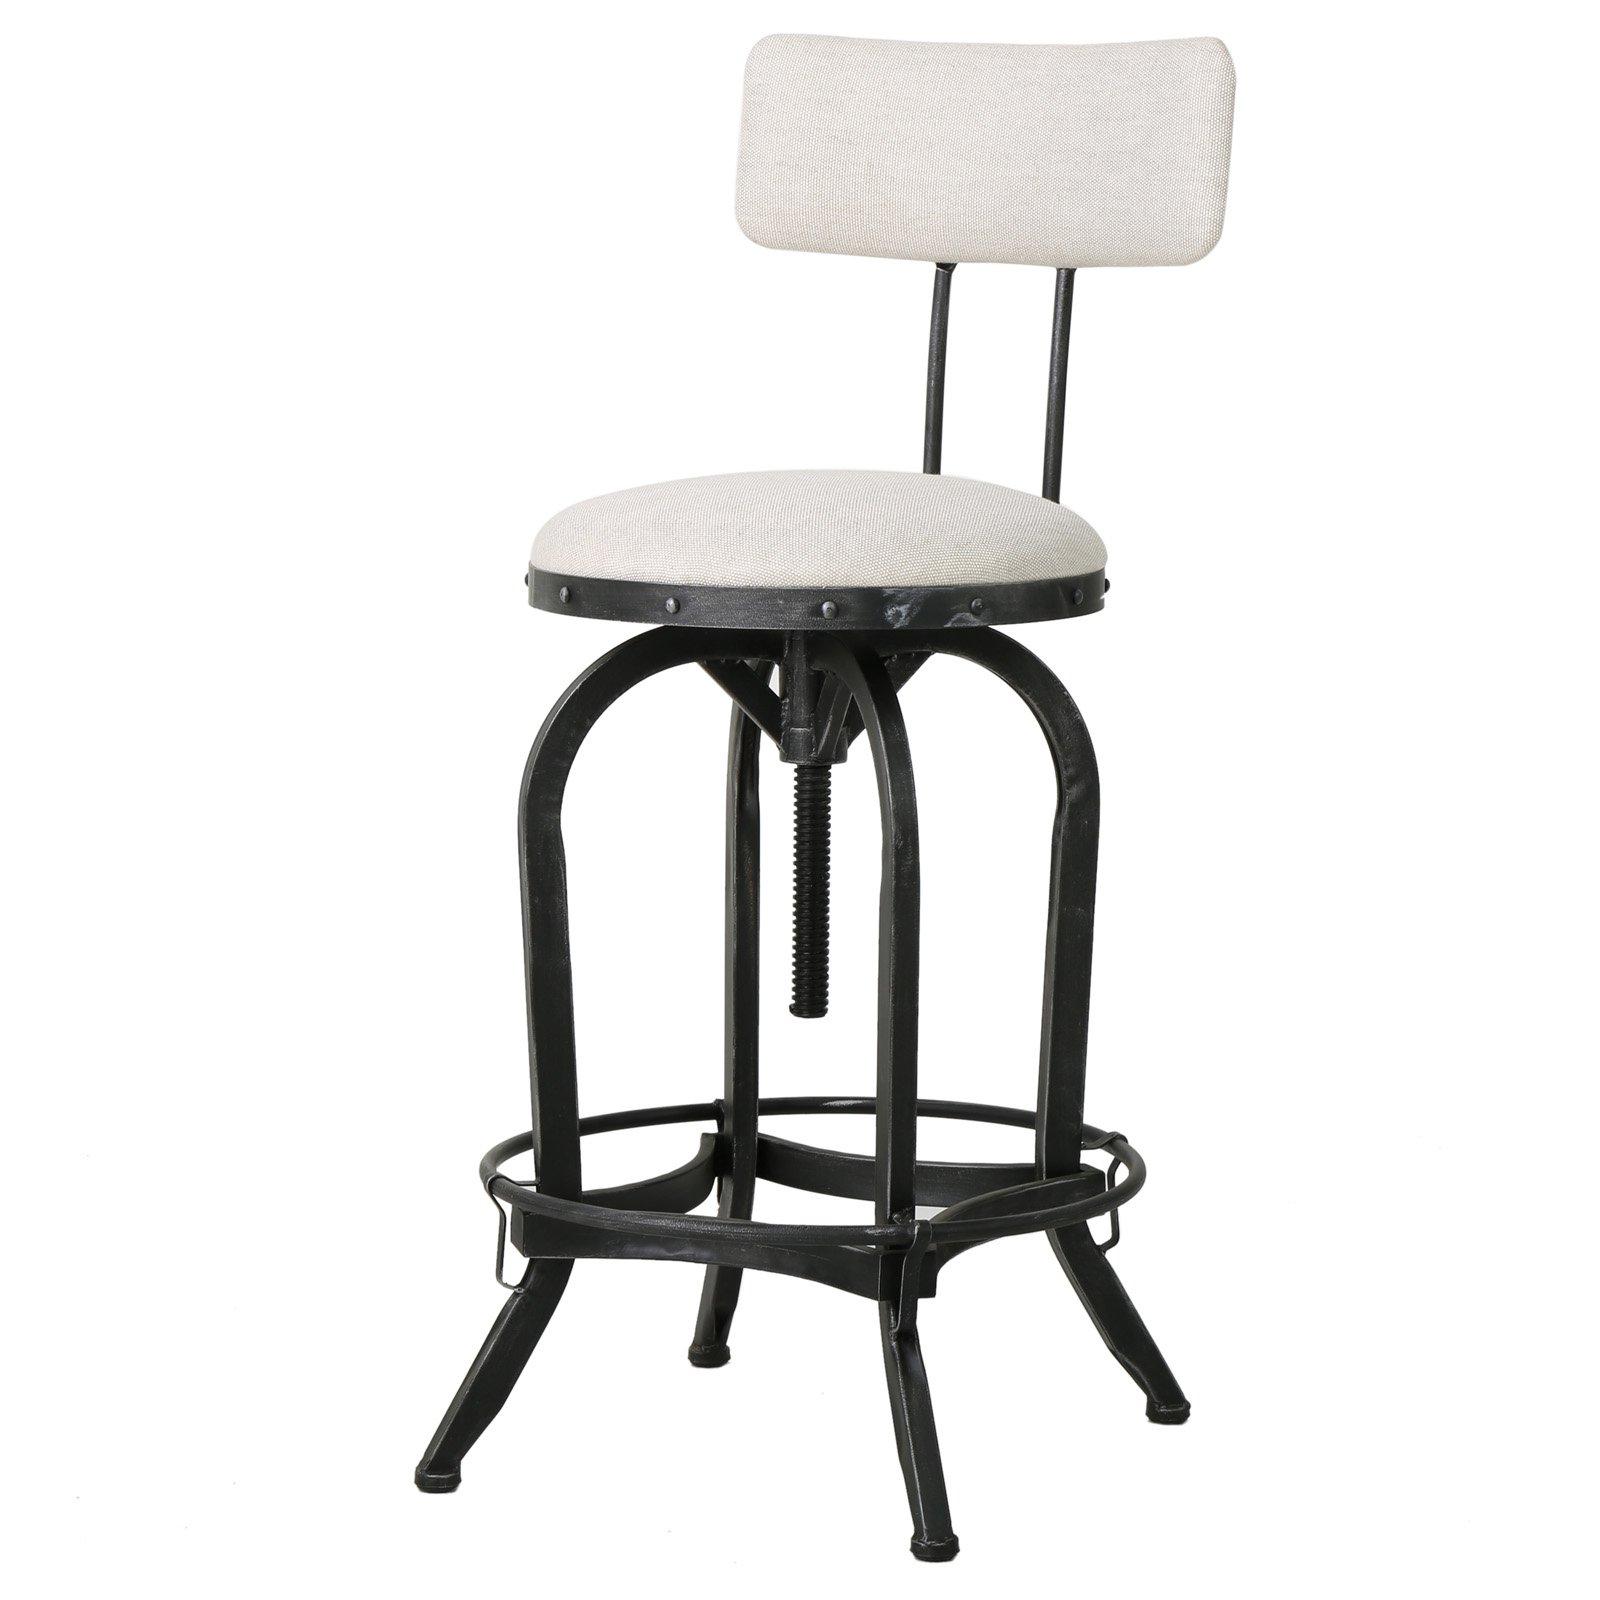 Brandon Bar Stool With Backrest Bar Stools Swivel Bar Stools Adjustable Bar Stools